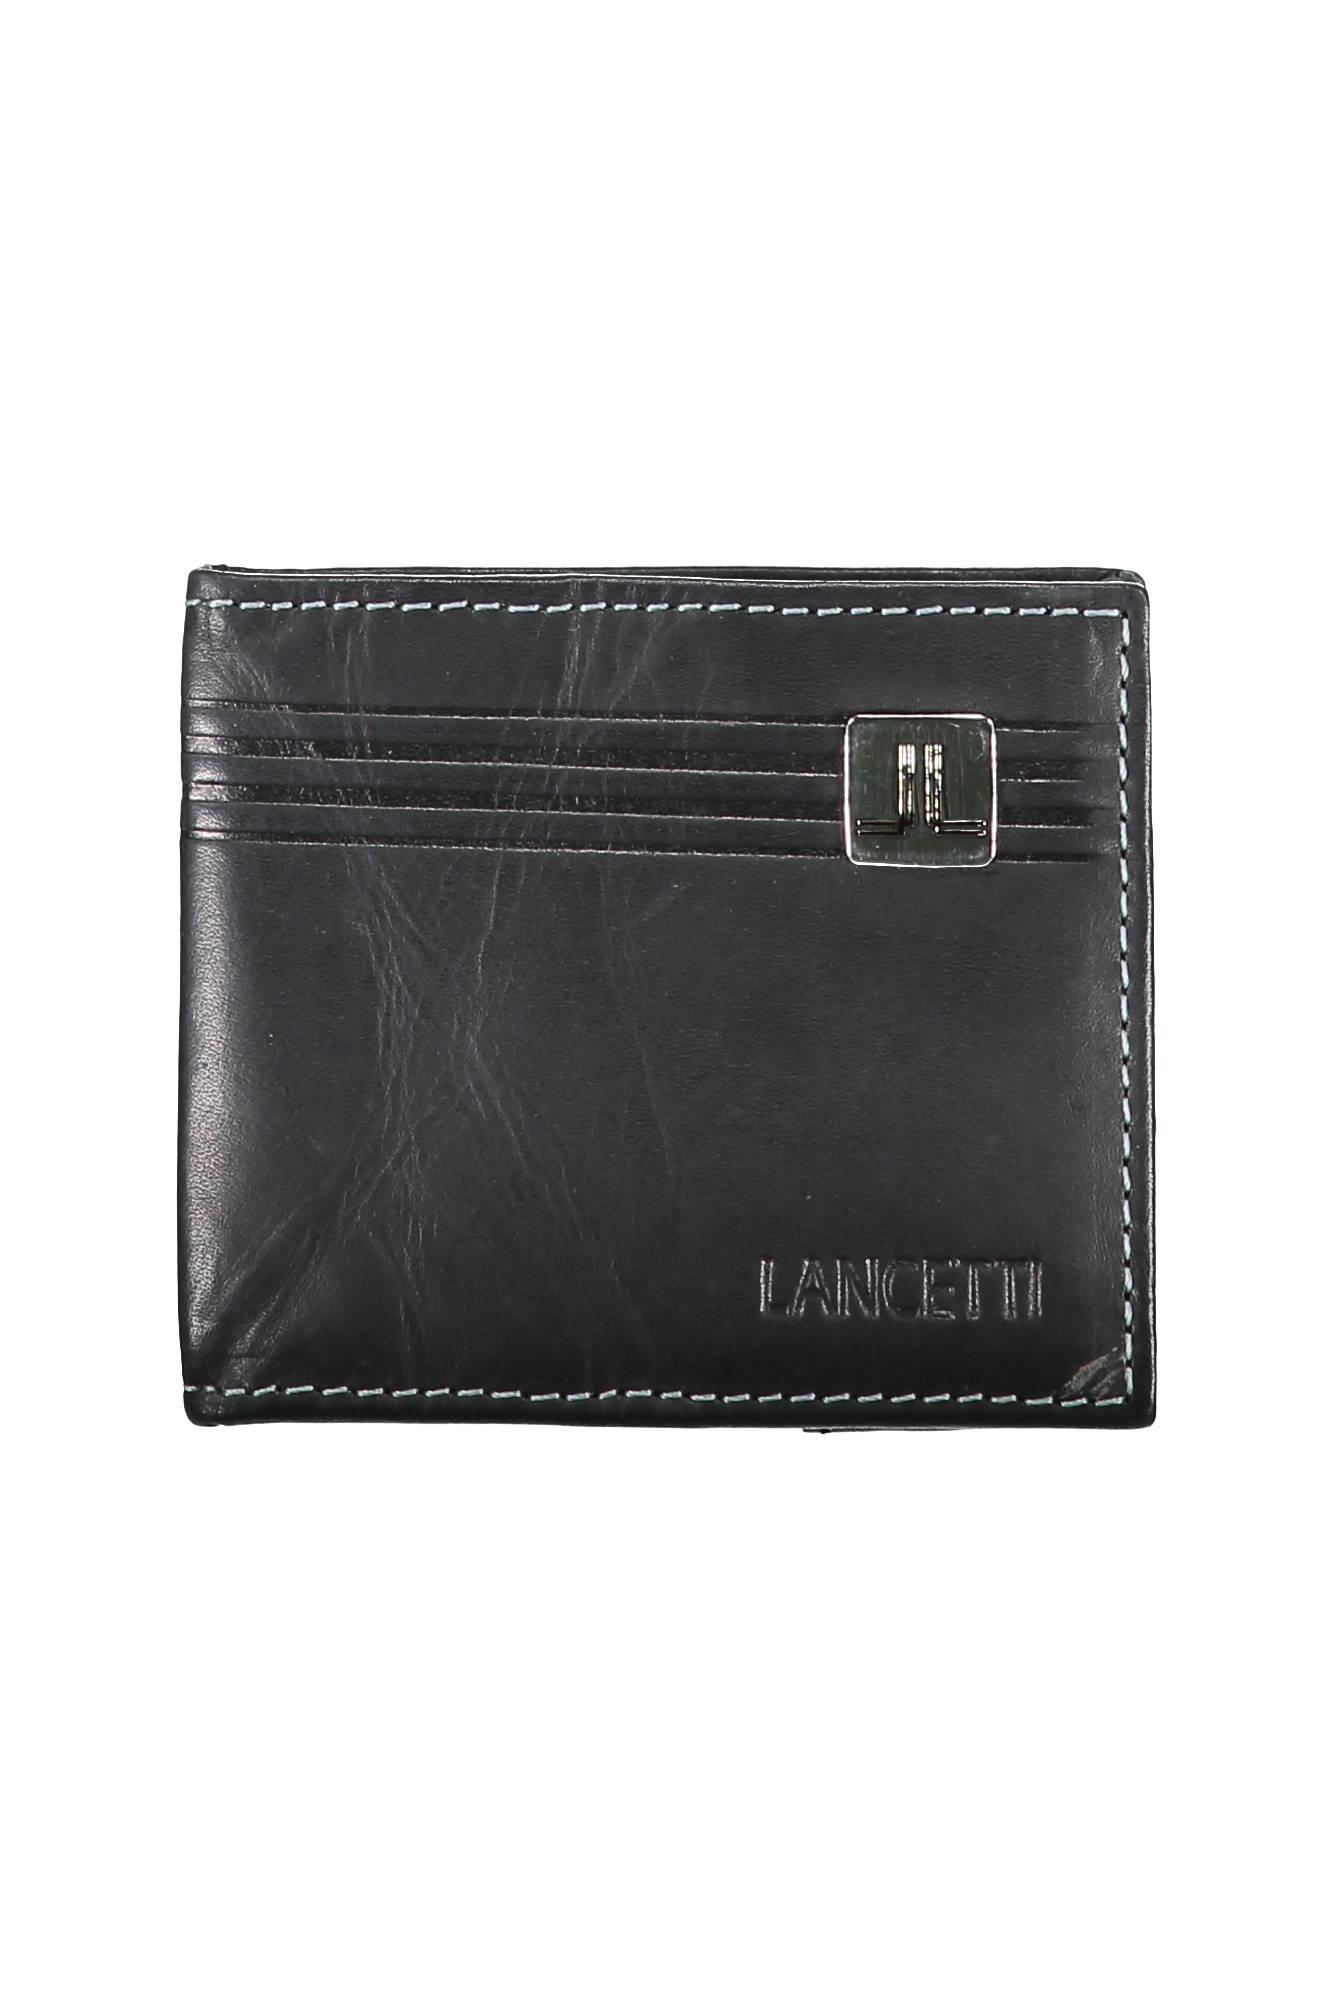 LANCETTI peněženka NERO